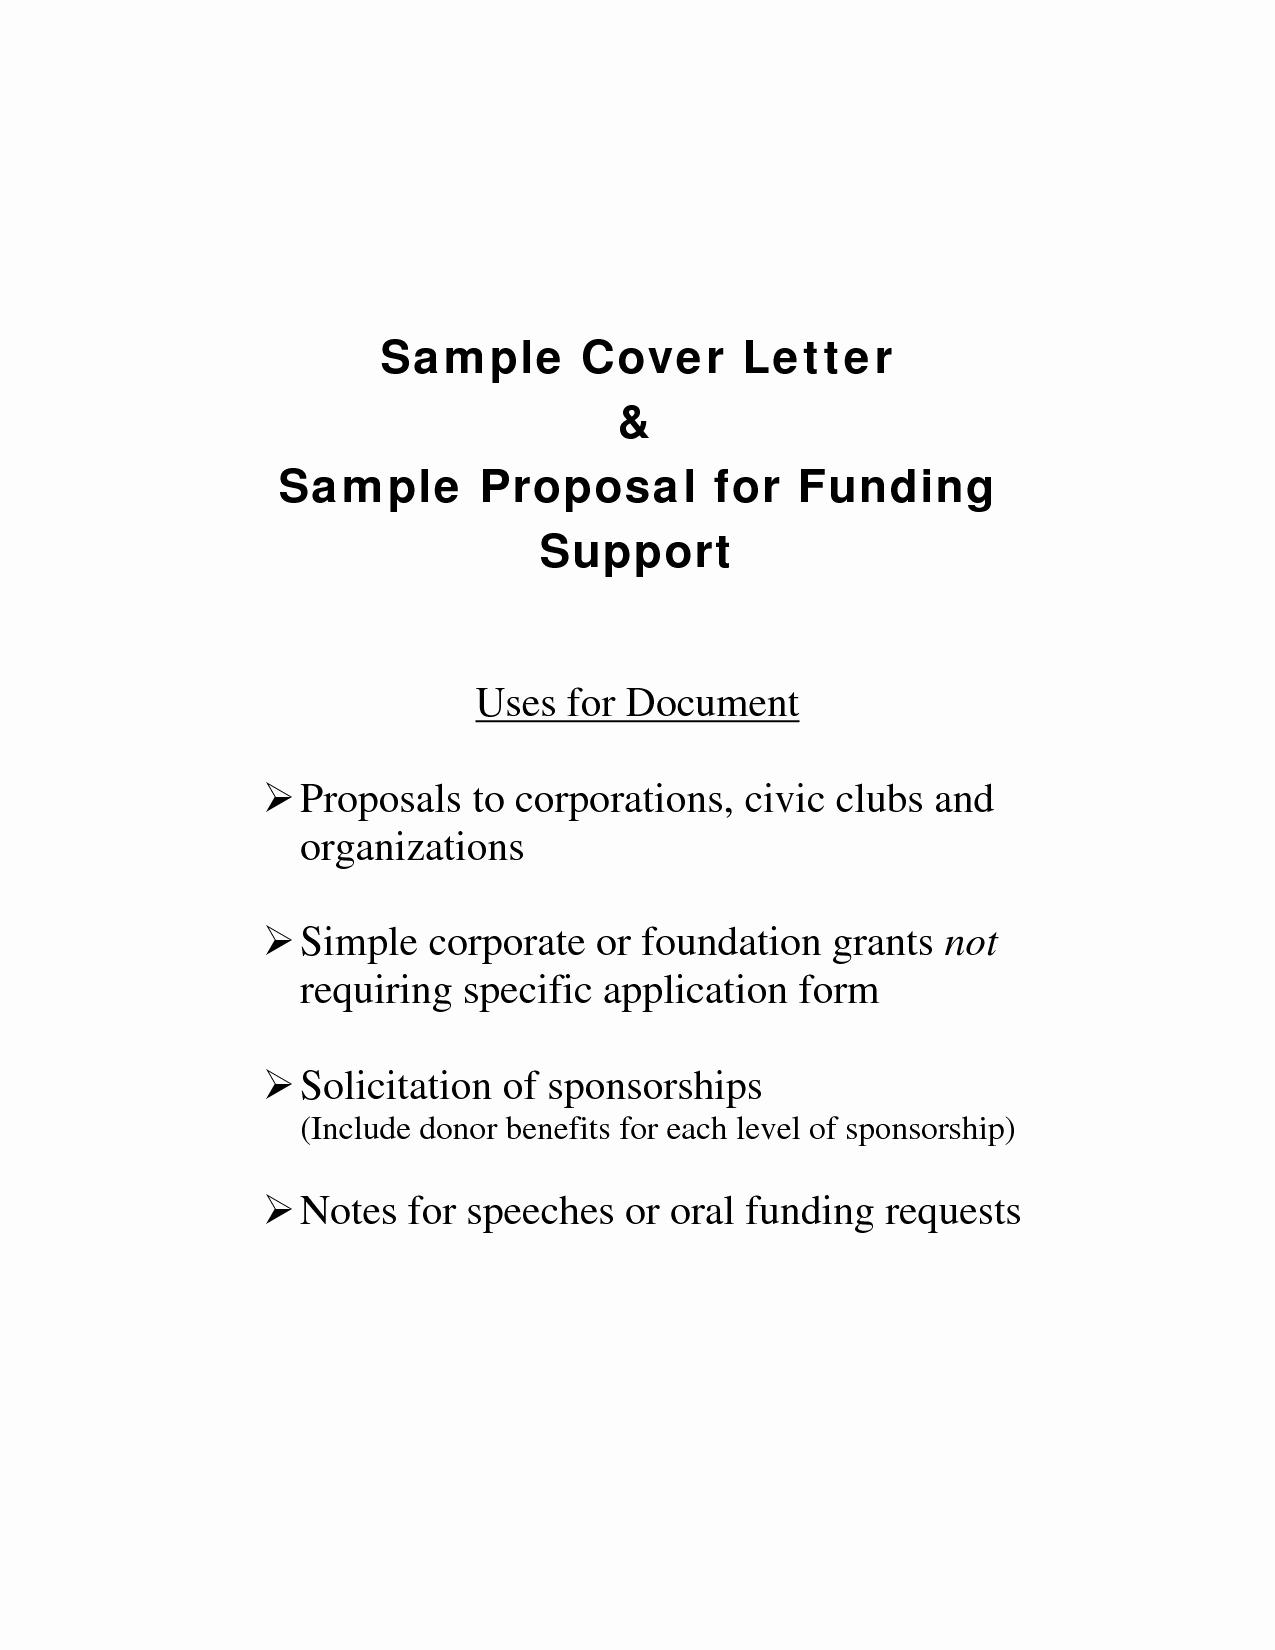 Sample Cover Letter for Grant Proposal Elegant Letter Of Support for Funding Sample & Templates